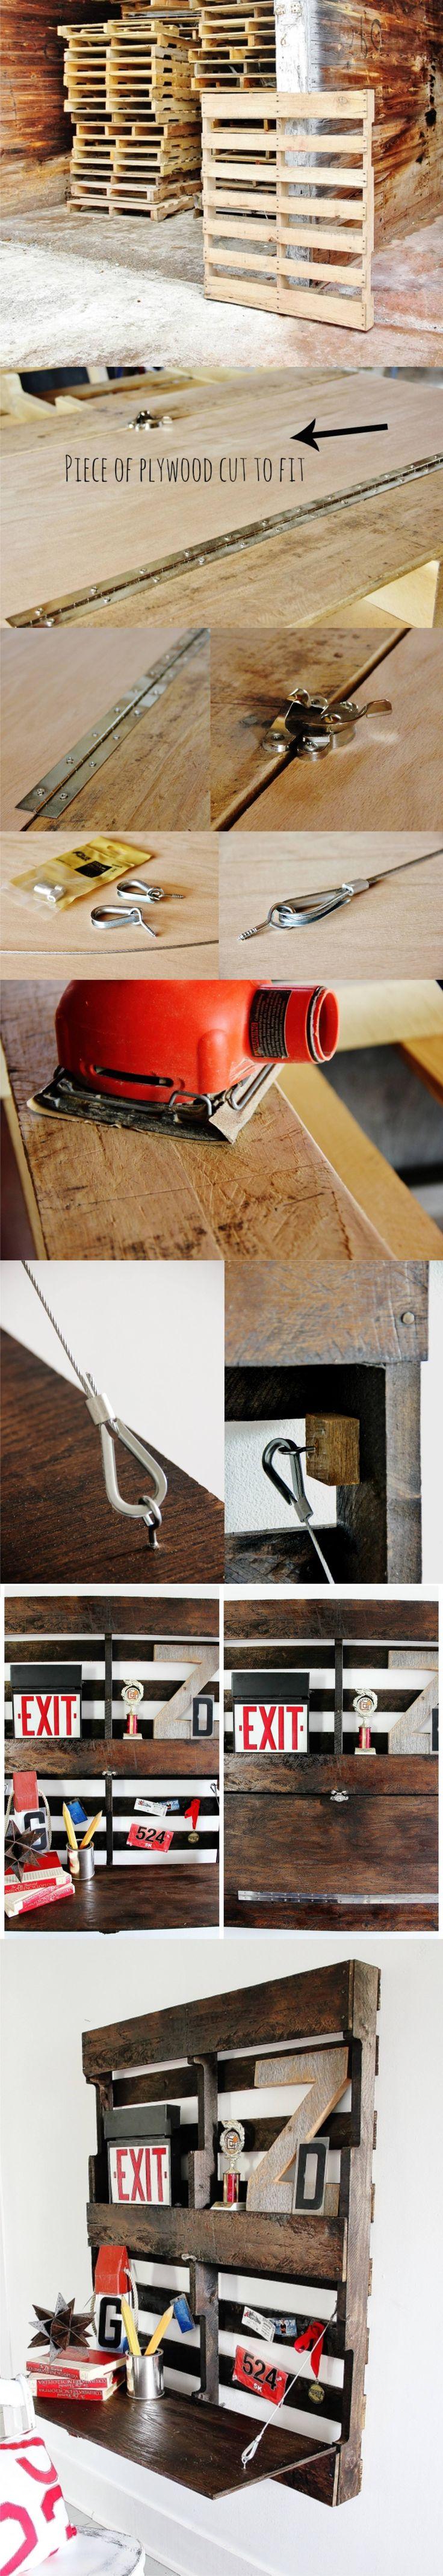 Estantería escritorio con palé - thistlewoodfarms.com - DIY Fold-up Pallet Desk